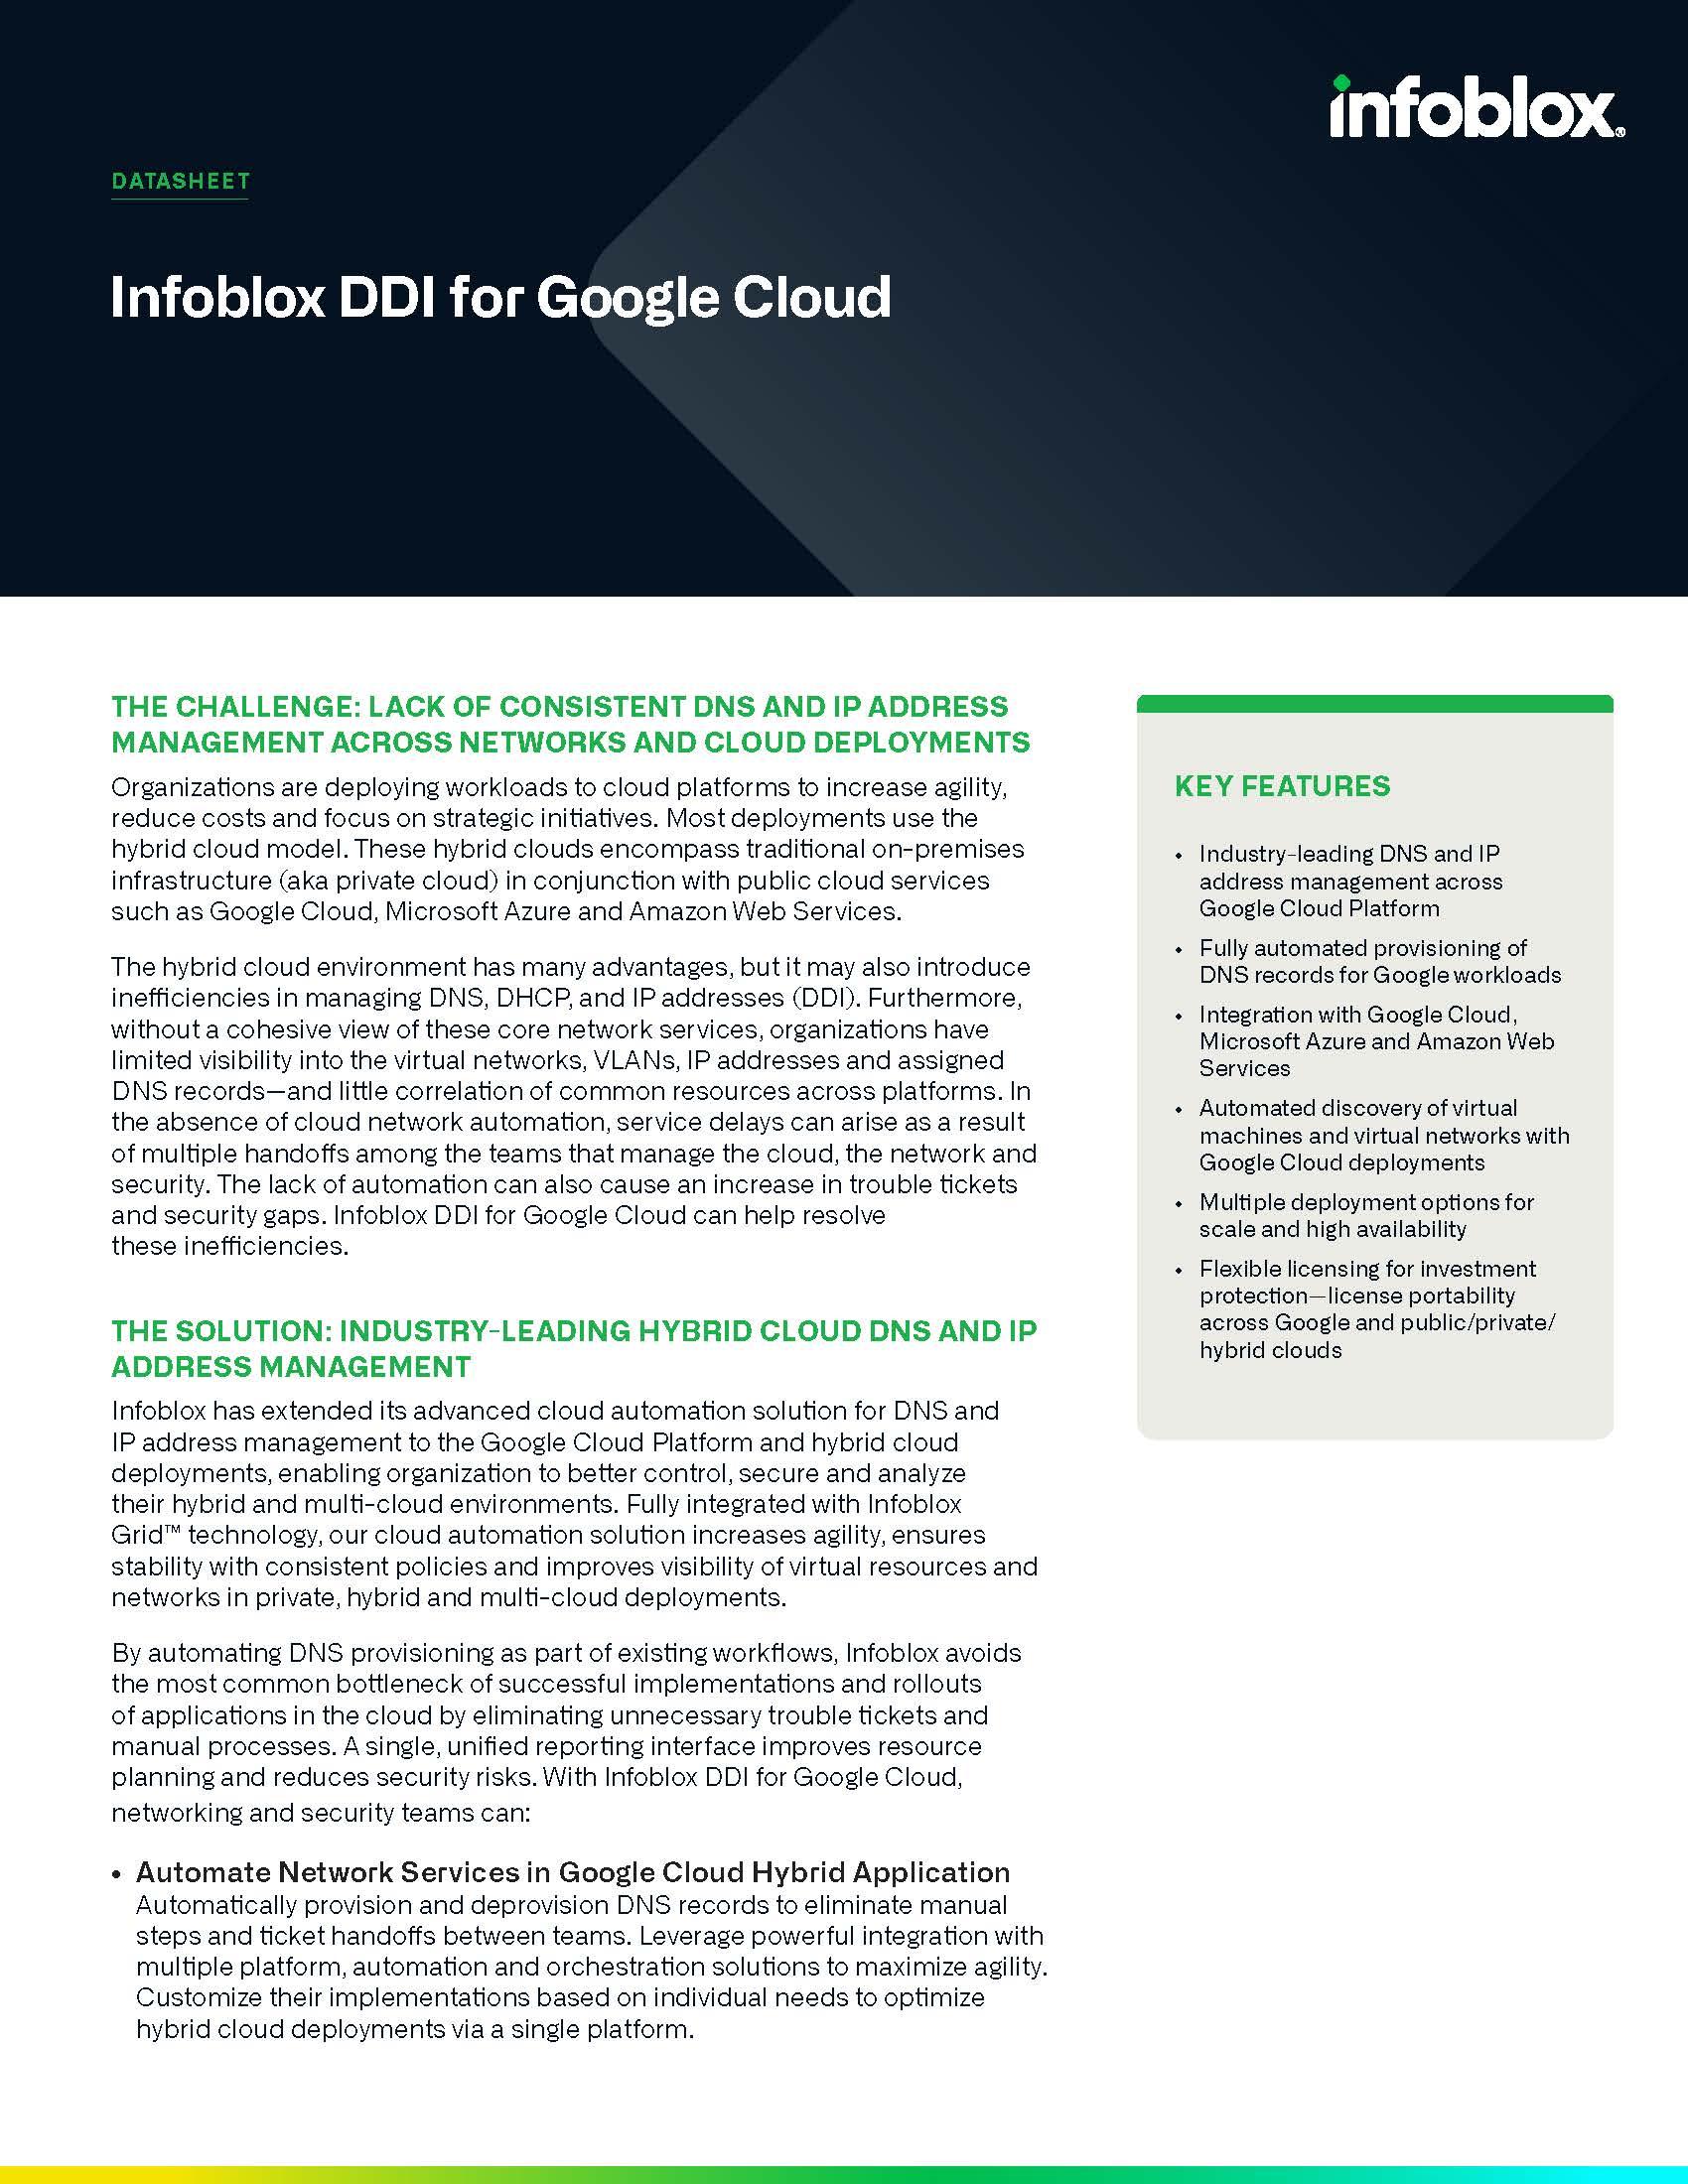 DDI For Google Cloud